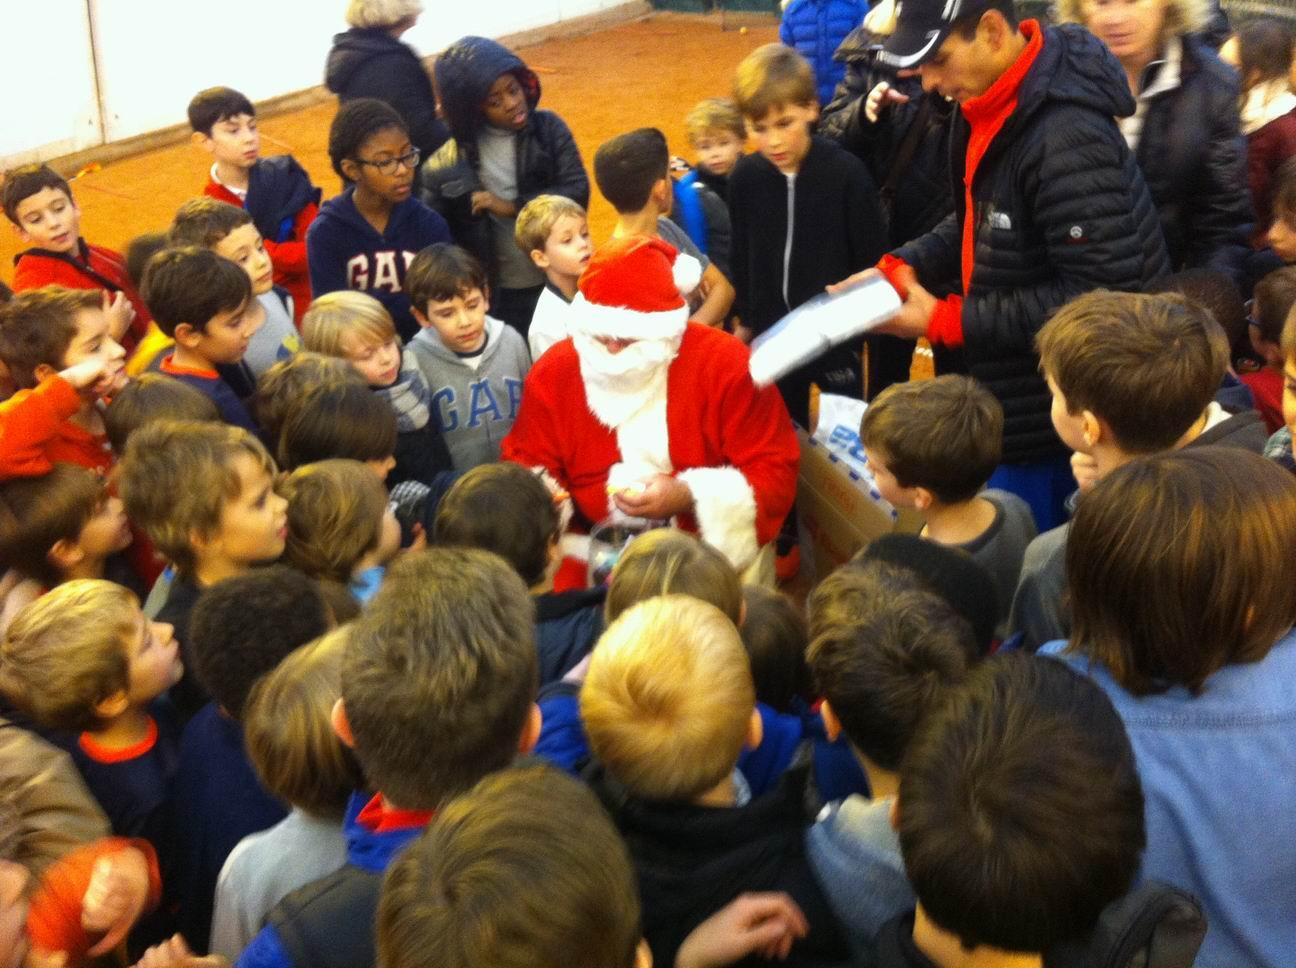 Fête-edt-Noel2014-17